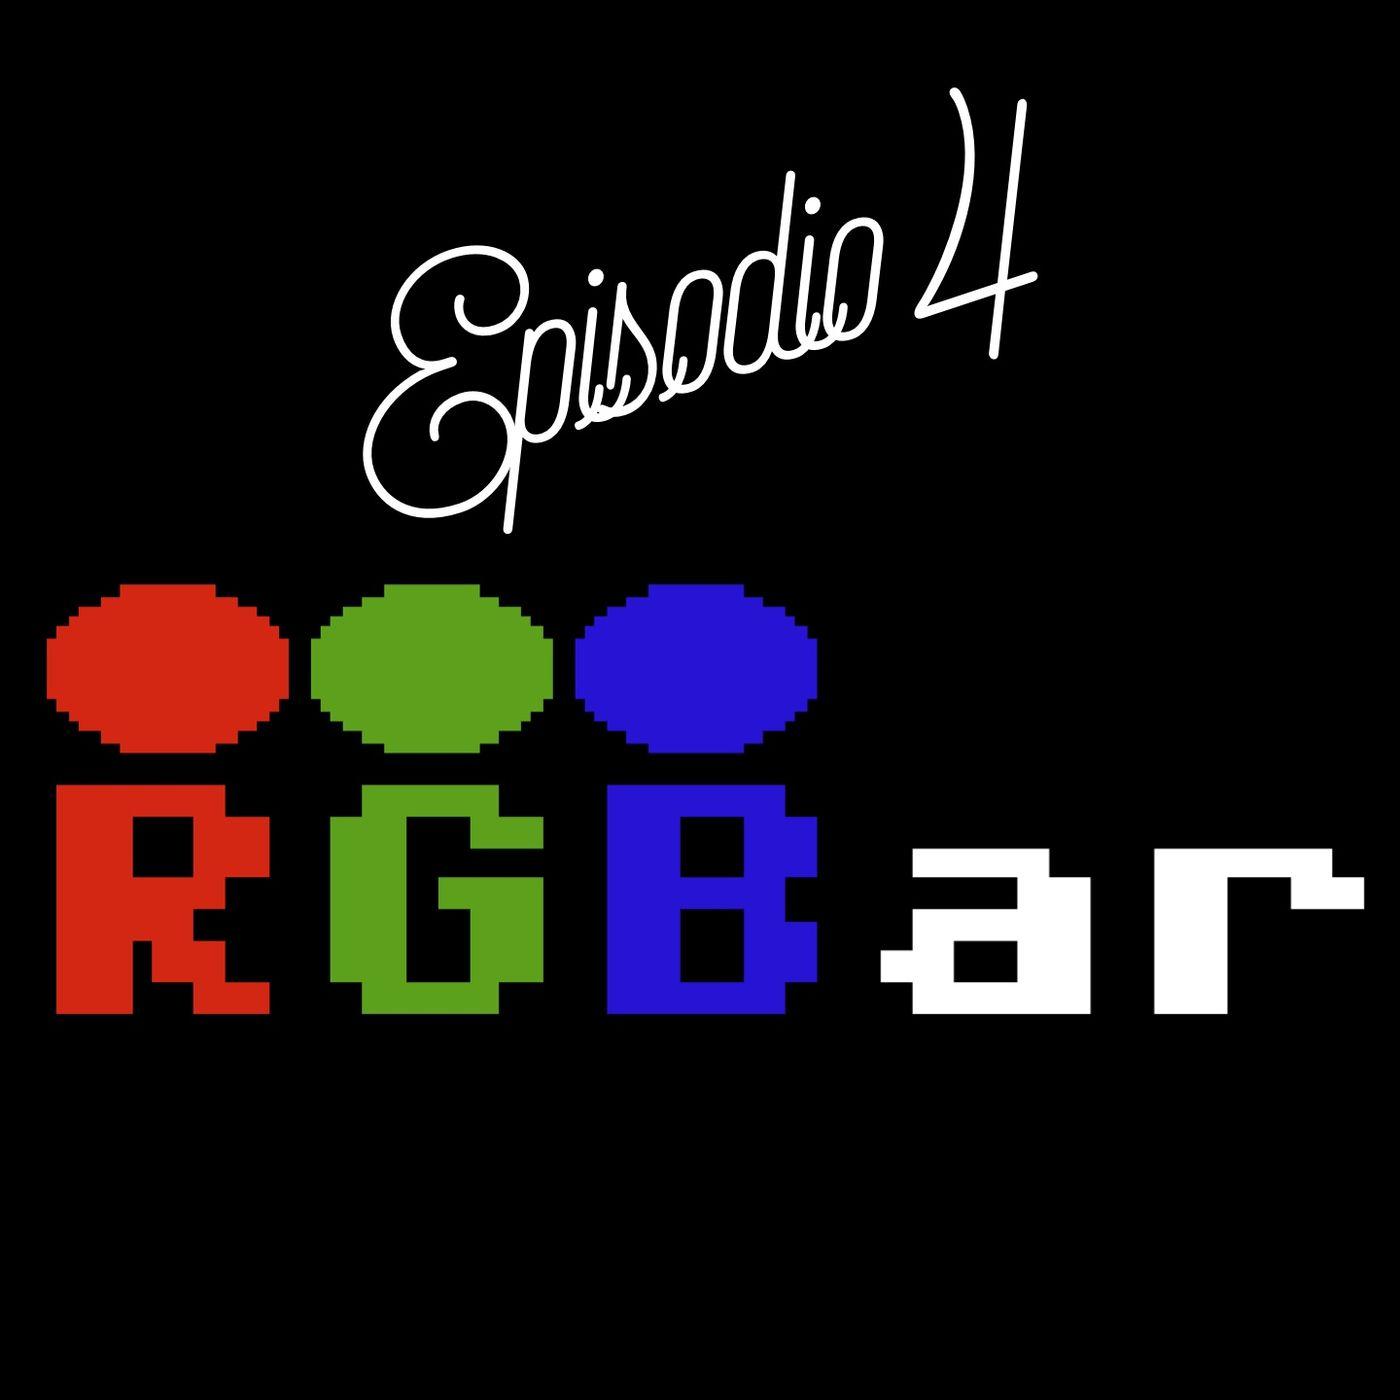 RGBar - Episodio 4